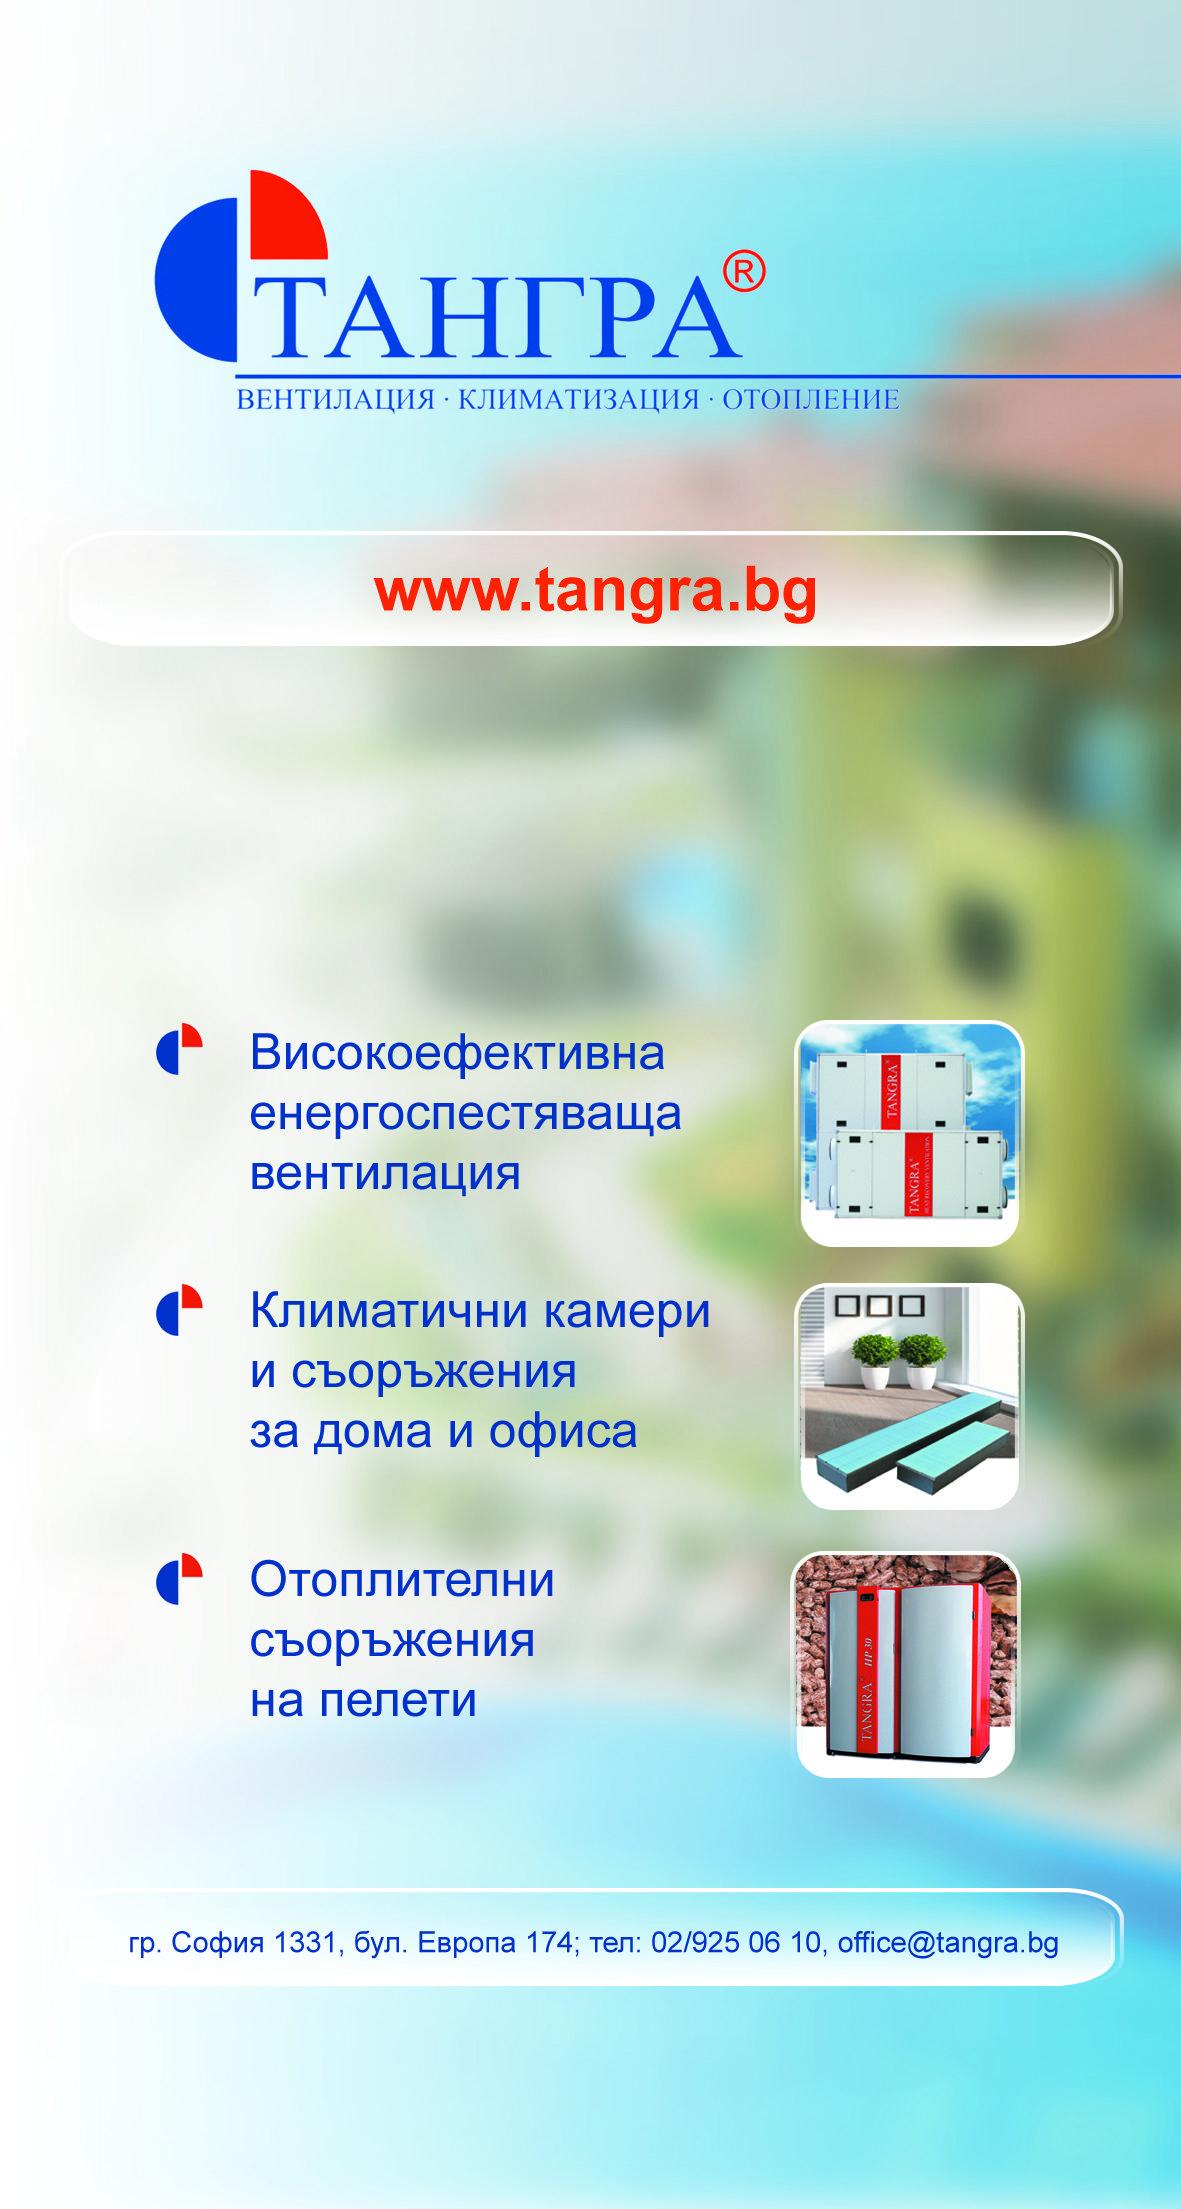 Енерегоспестяваща вентилация Heating and air